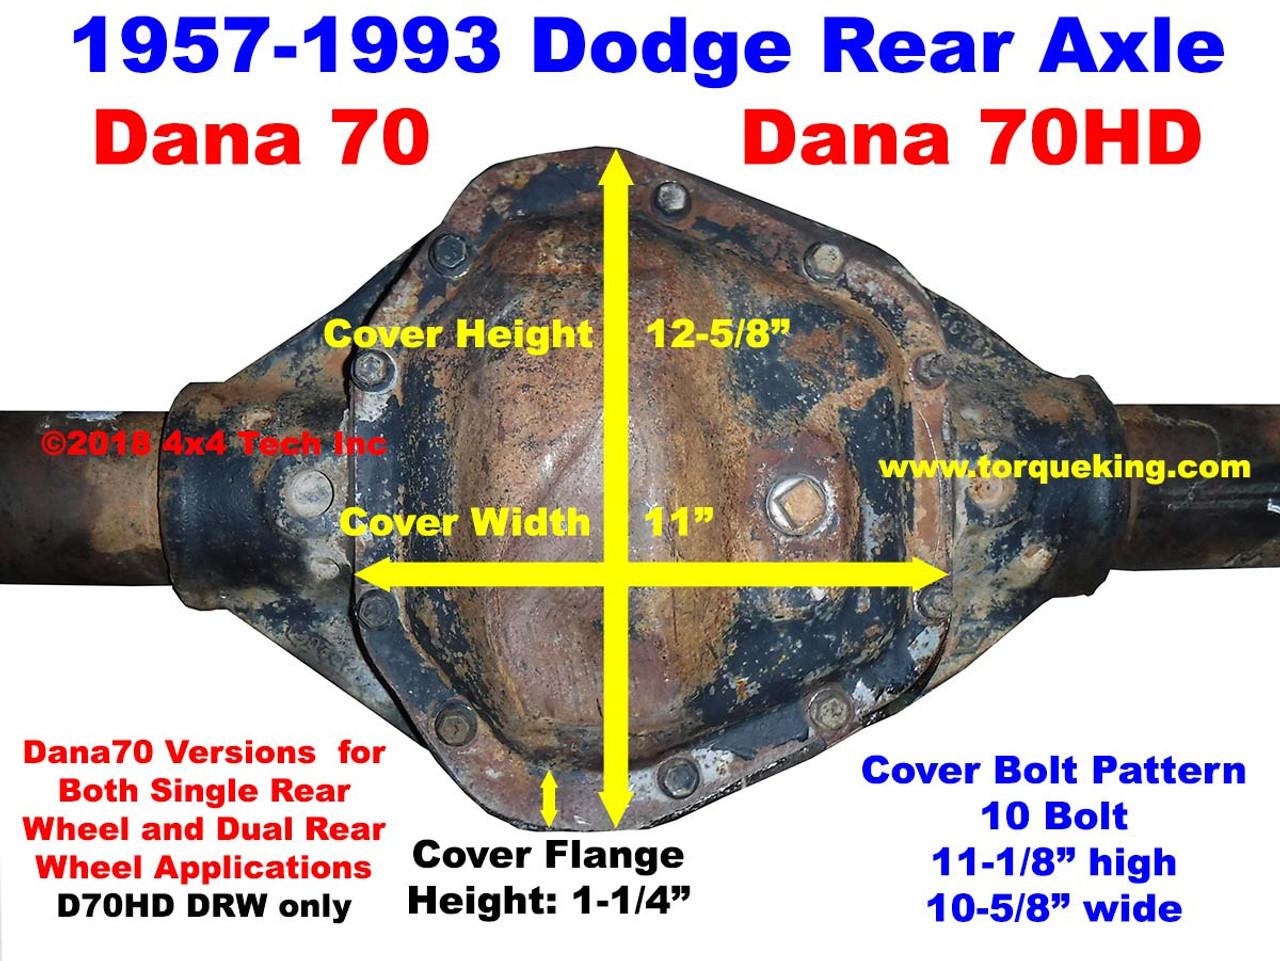 How To Id A 19571993 Dodge Dana 70 Rear Axle. How To Id A 19571993 Dodge Dana 70 Rear Axle Cover. Dodge. 93 Dodge Dana 44 Locking Hub Diagram At Scoala.co